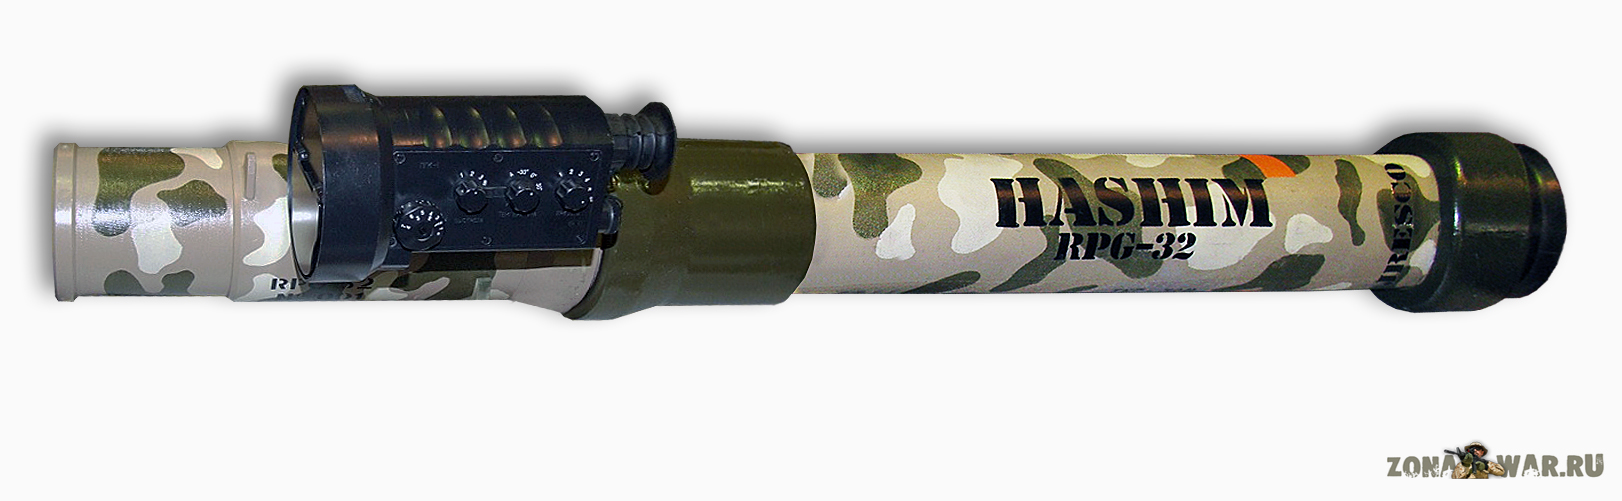 RPG-32 anti-tank rocket launcher